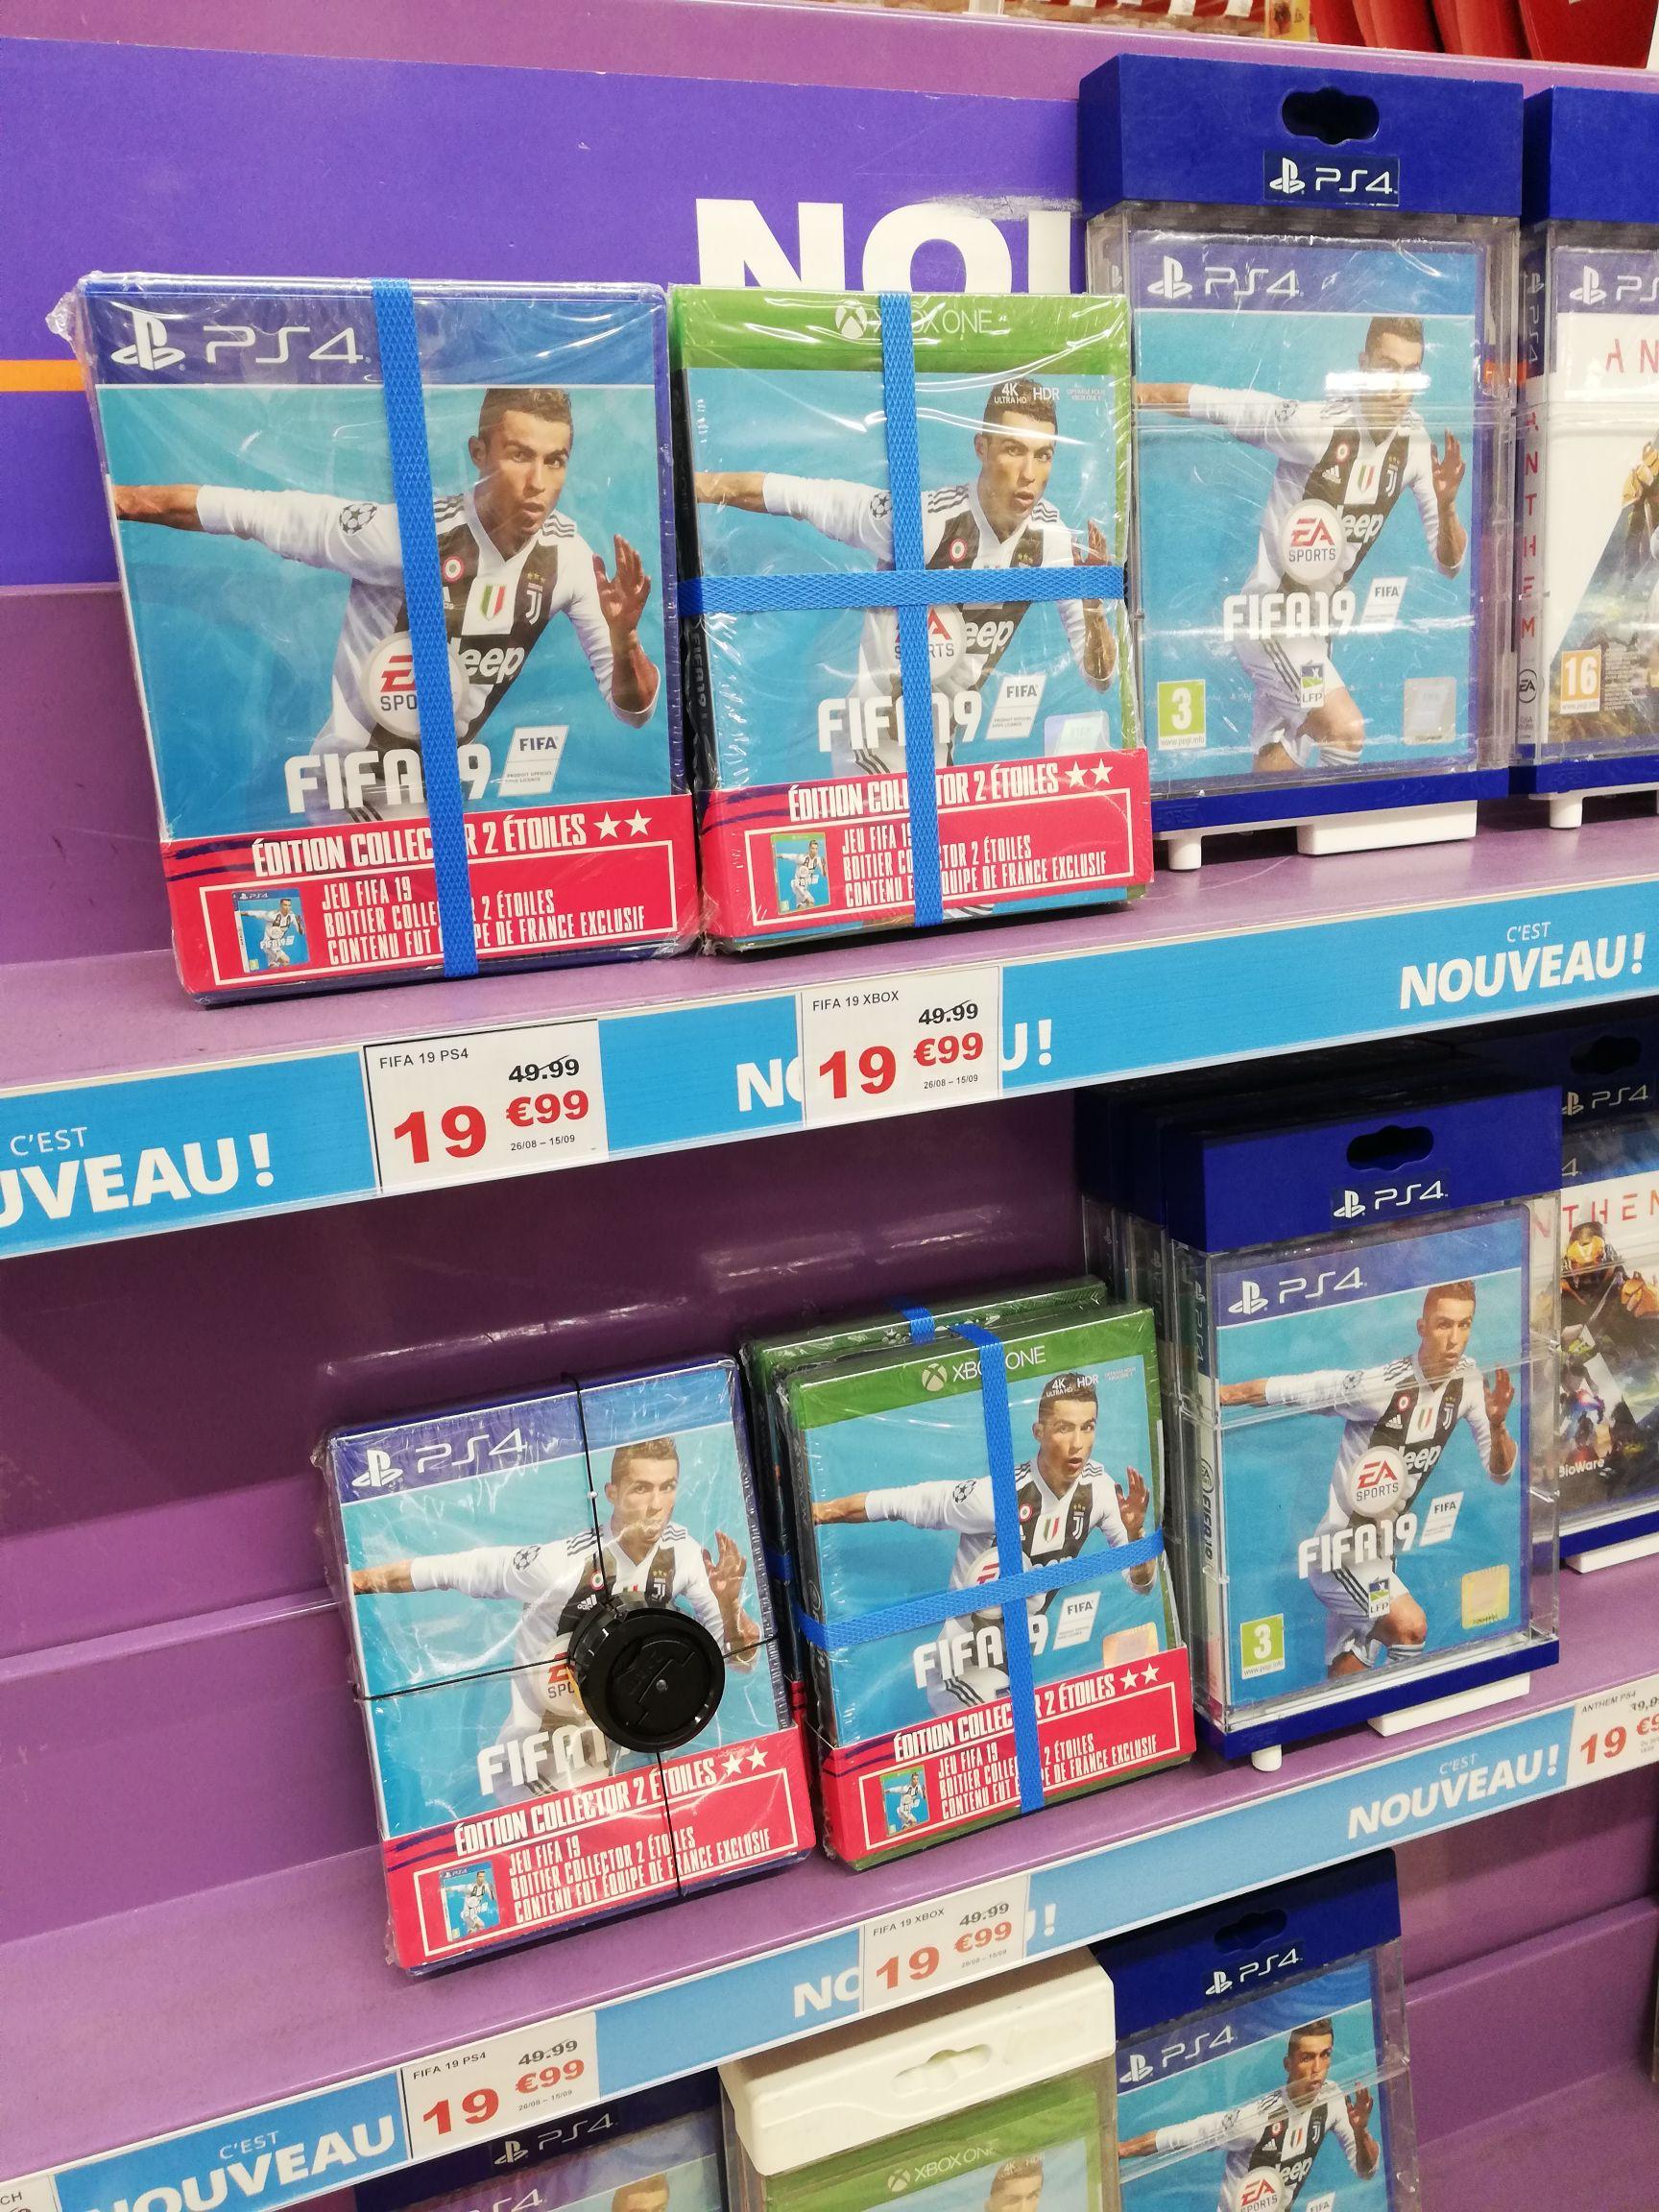 FIFA 2019 sur PS4 ou Xbox One - Val d'Europe (77)